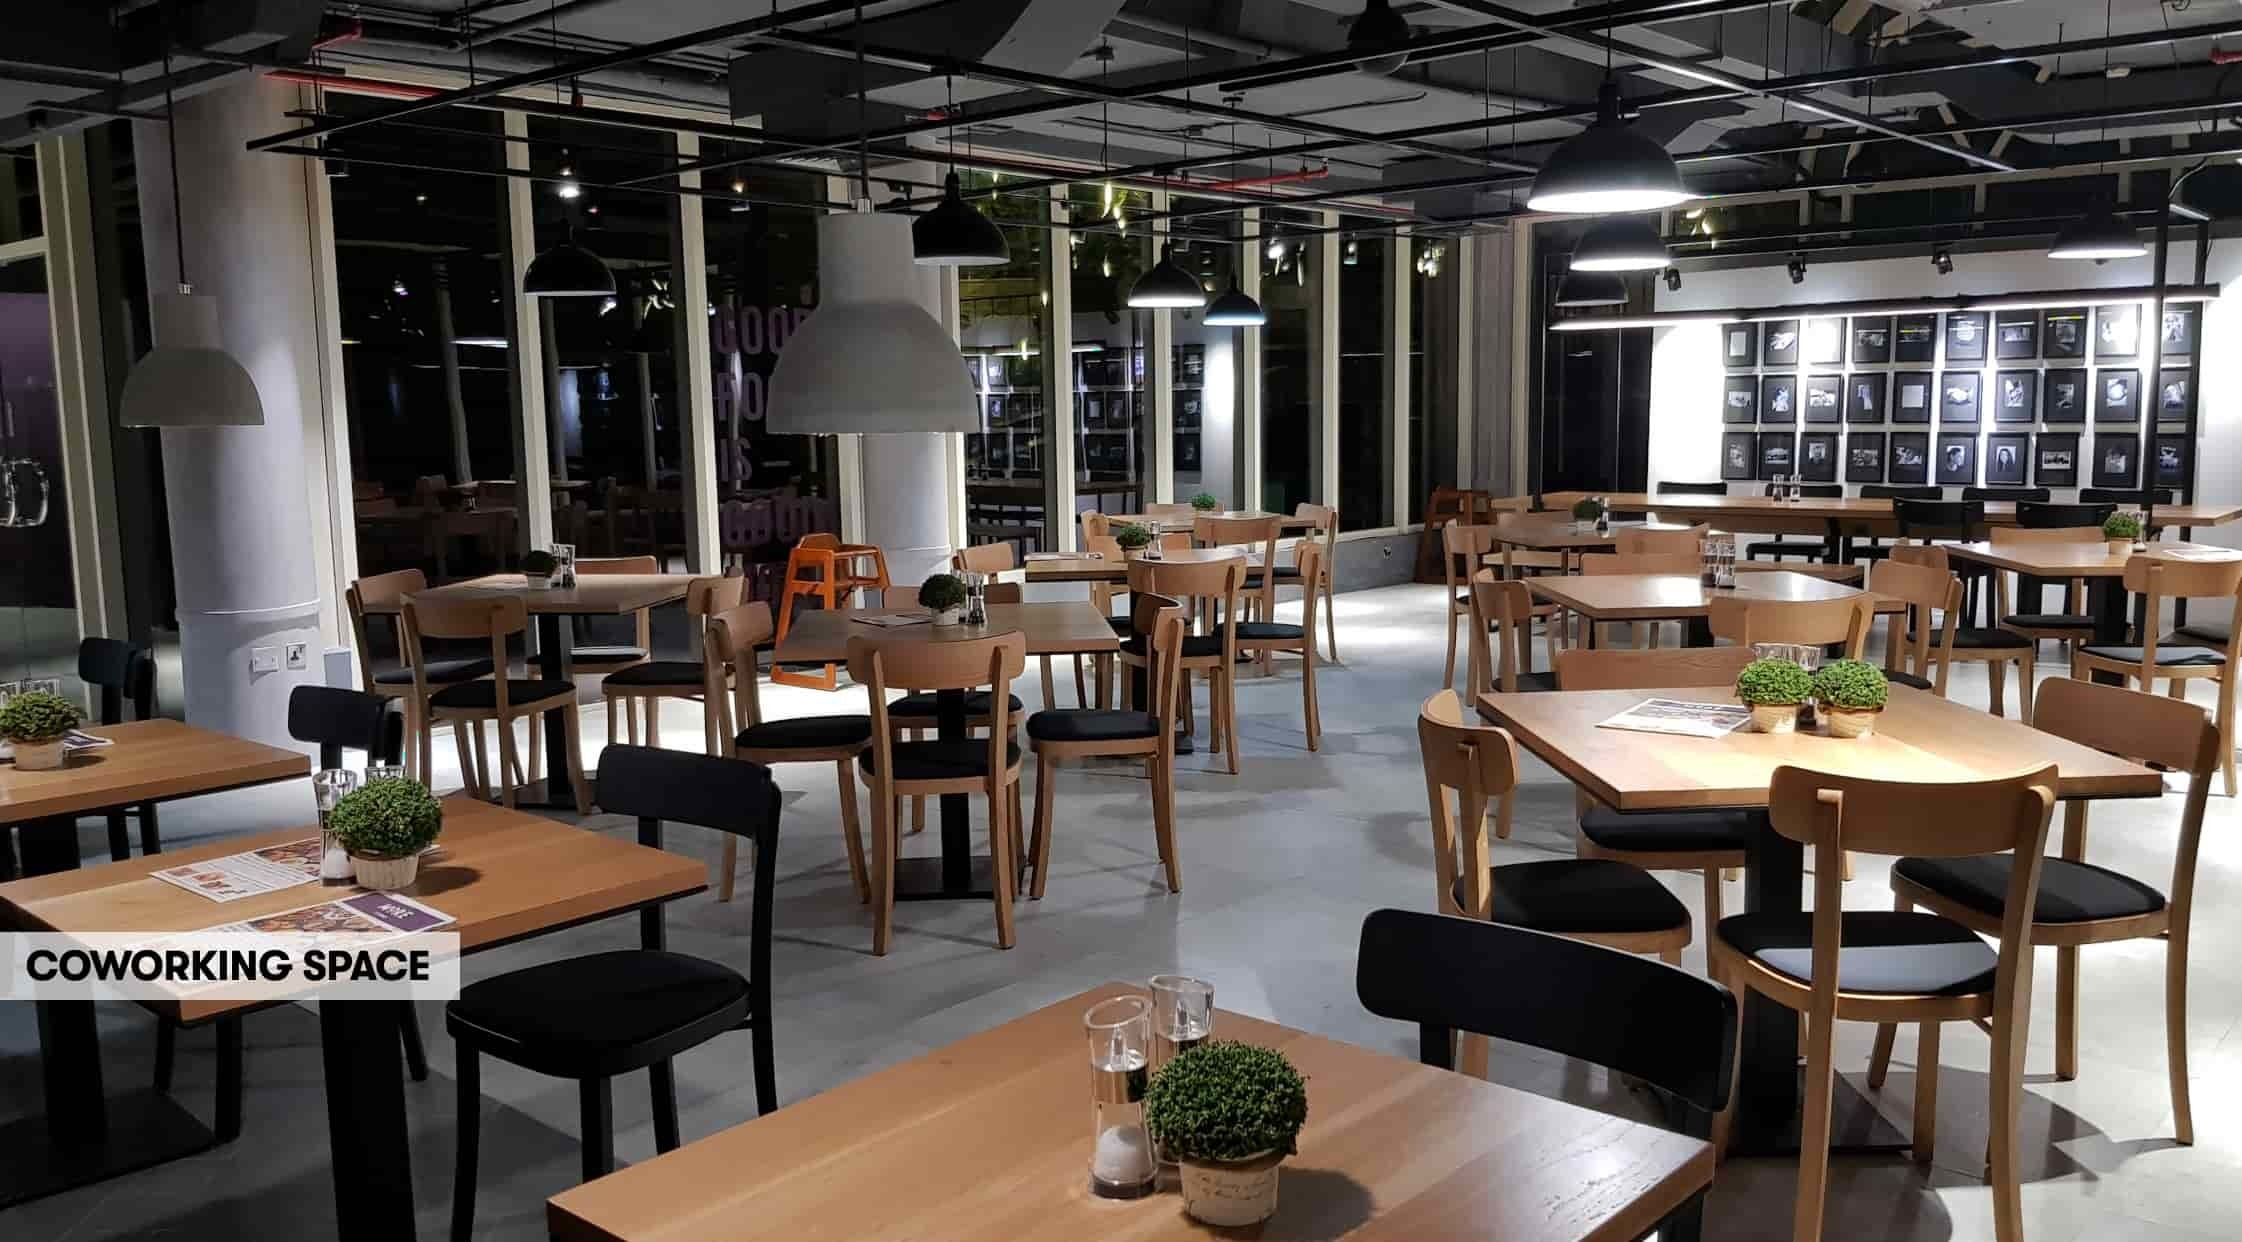 Impact Hub Dubai Coworking space